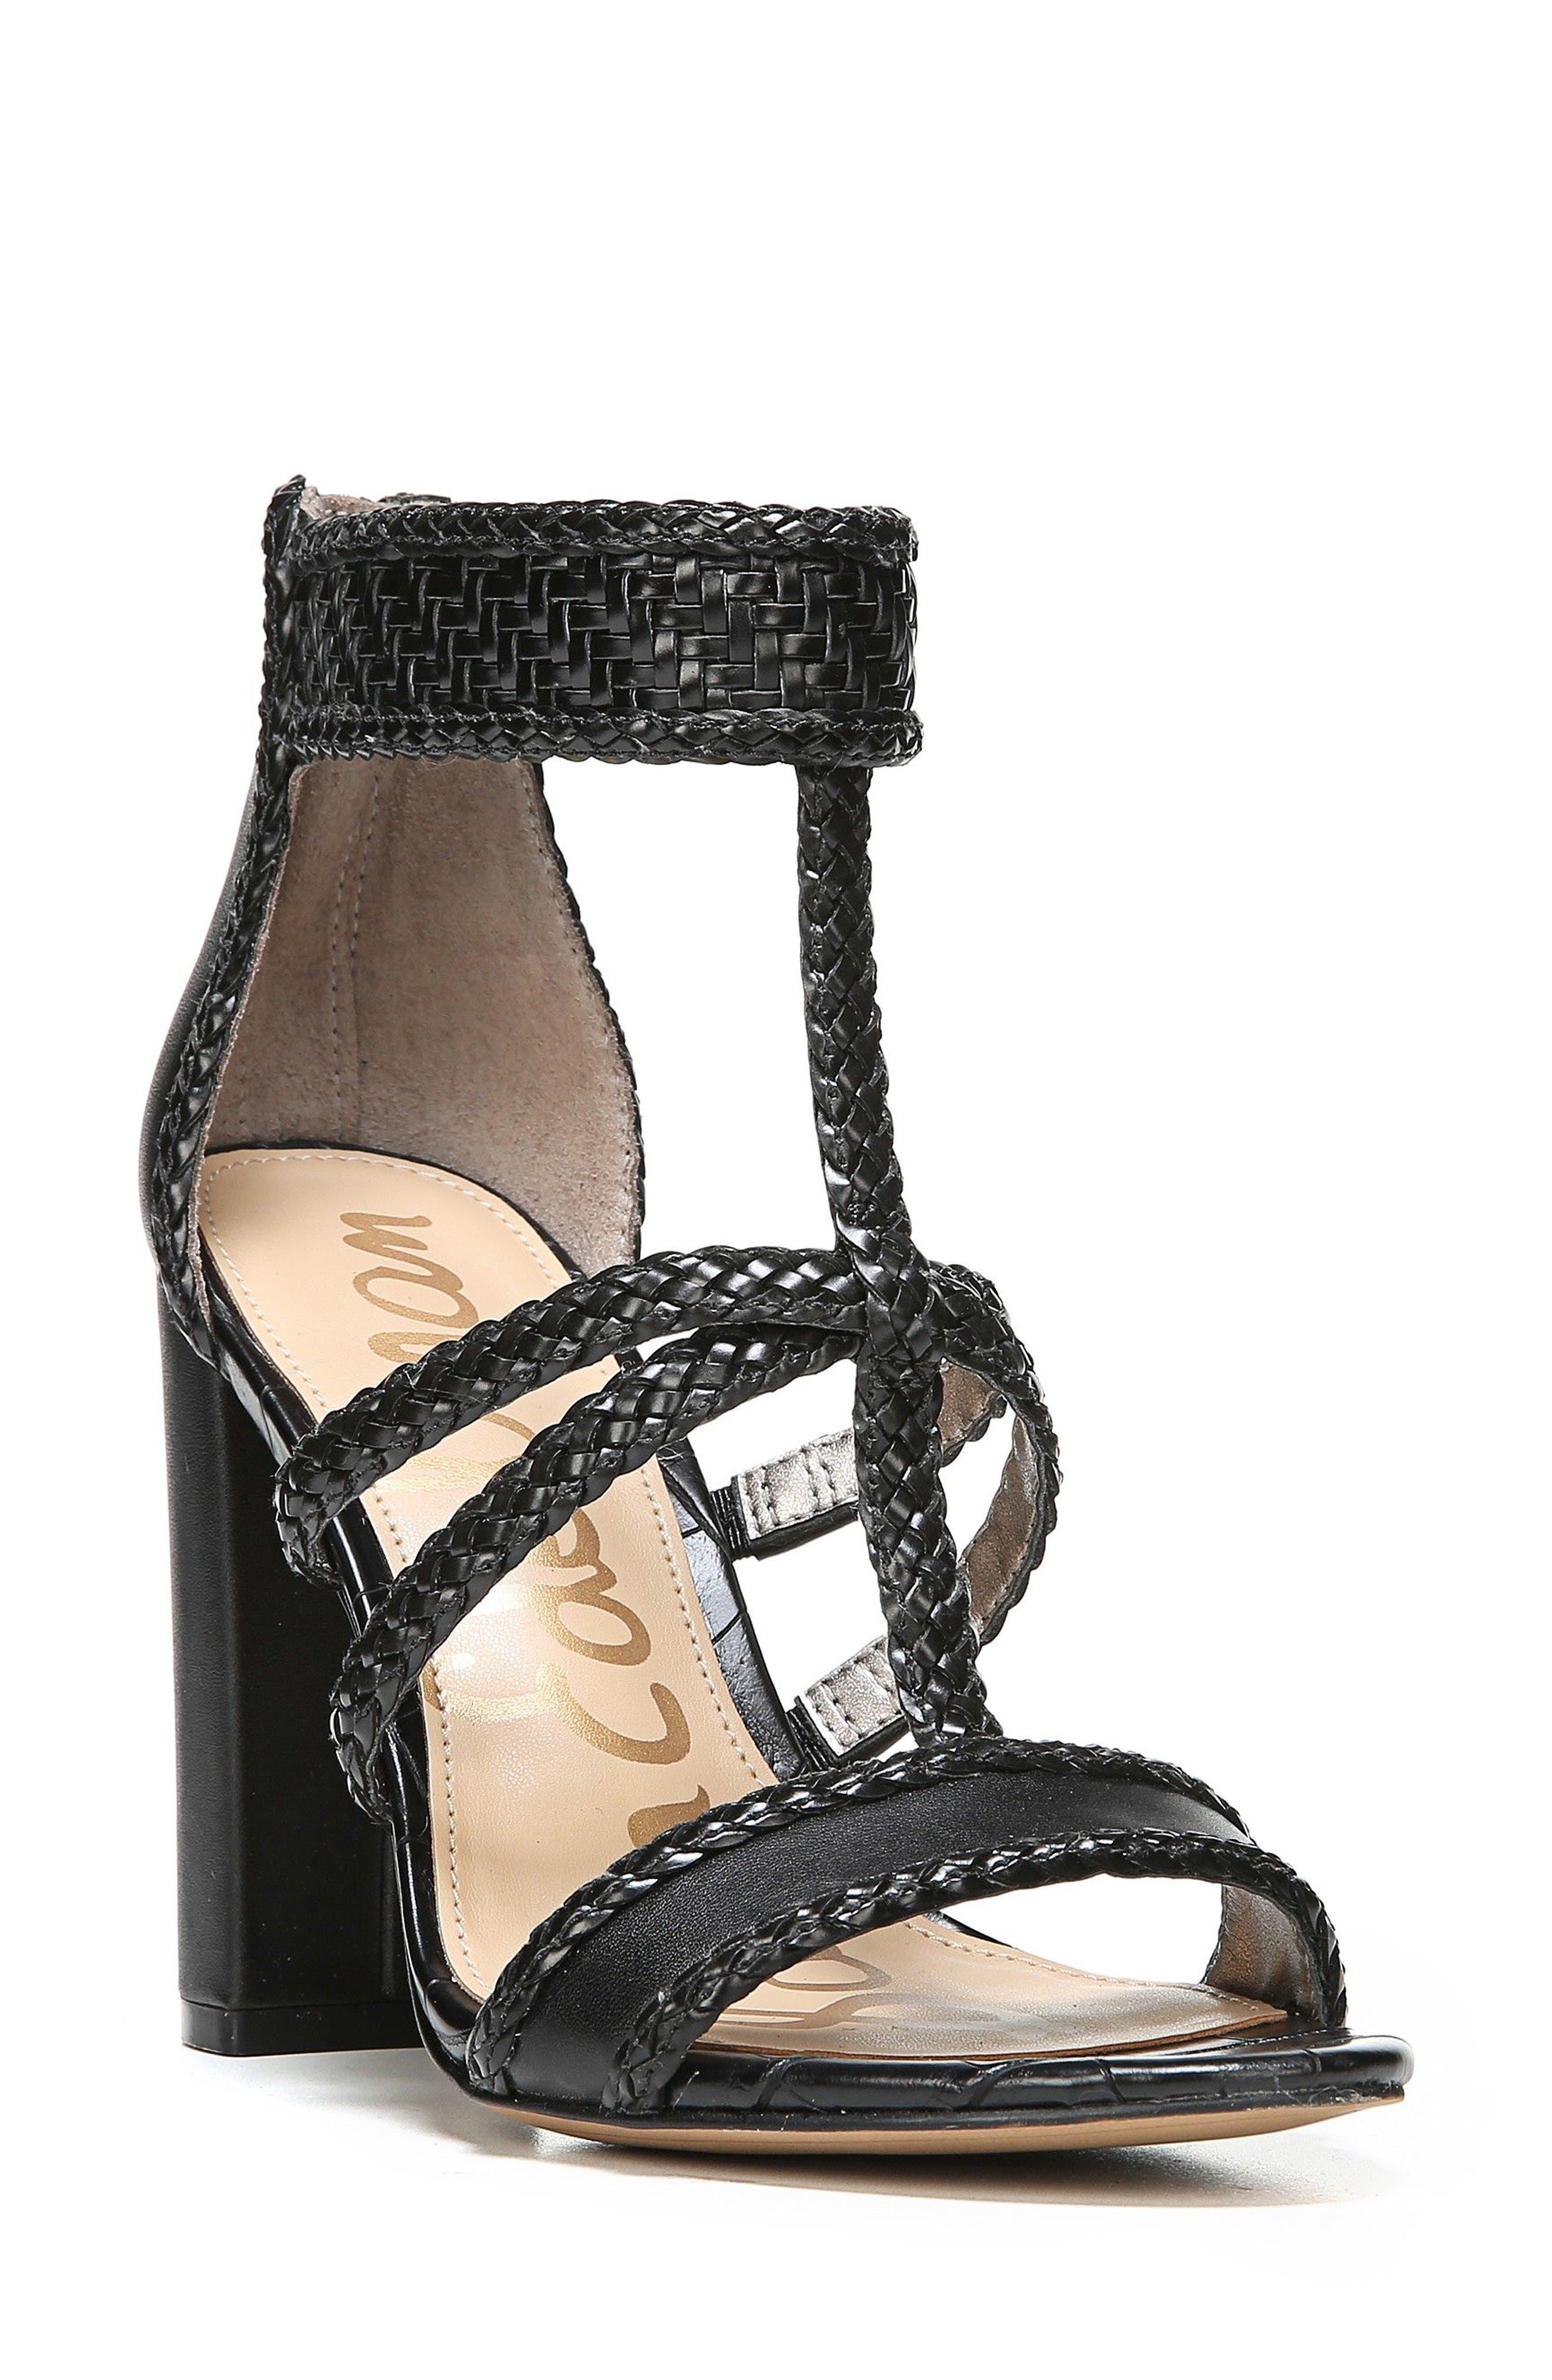 Yordana Woven T-Strap Sandal,                             Main thumbnail 1, color,                             001